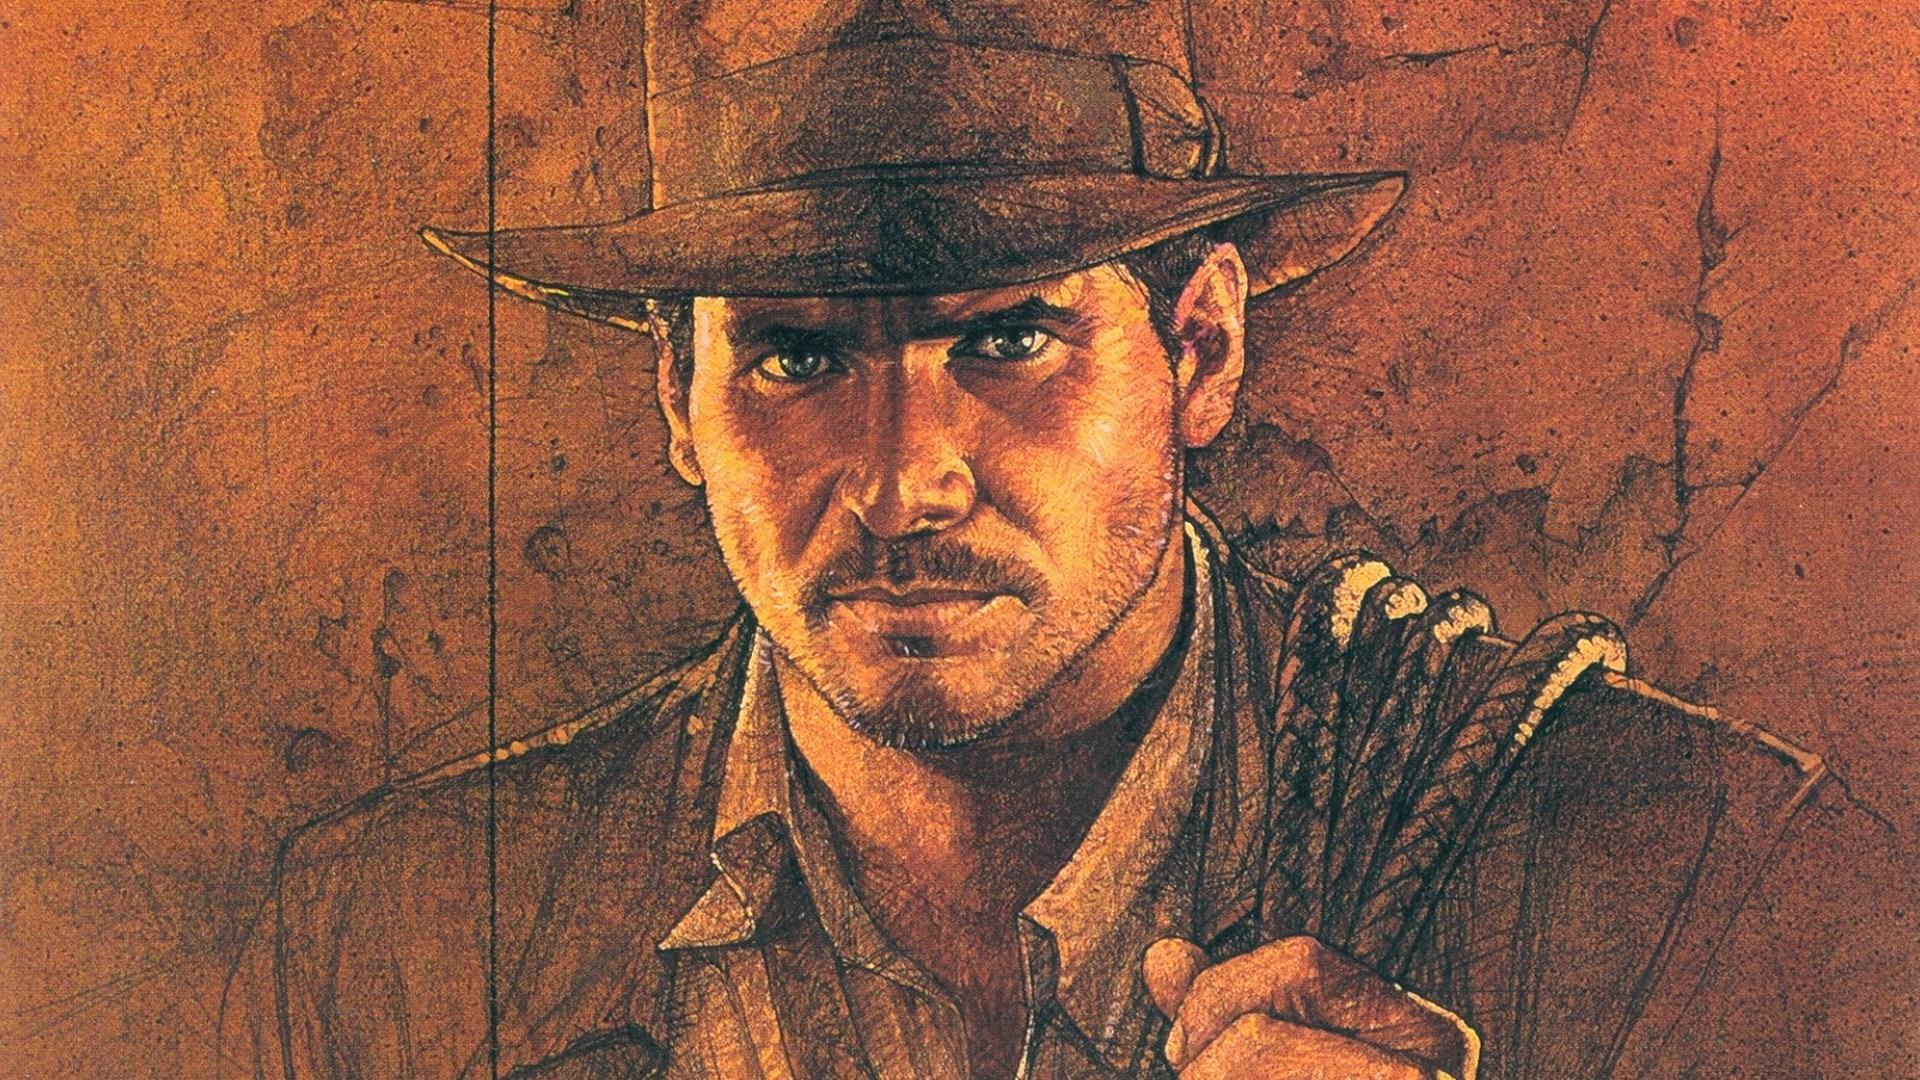 Indiana Jones Wallpaper 1920x1080 Indiana Jones Harrison Ford 1920x1080